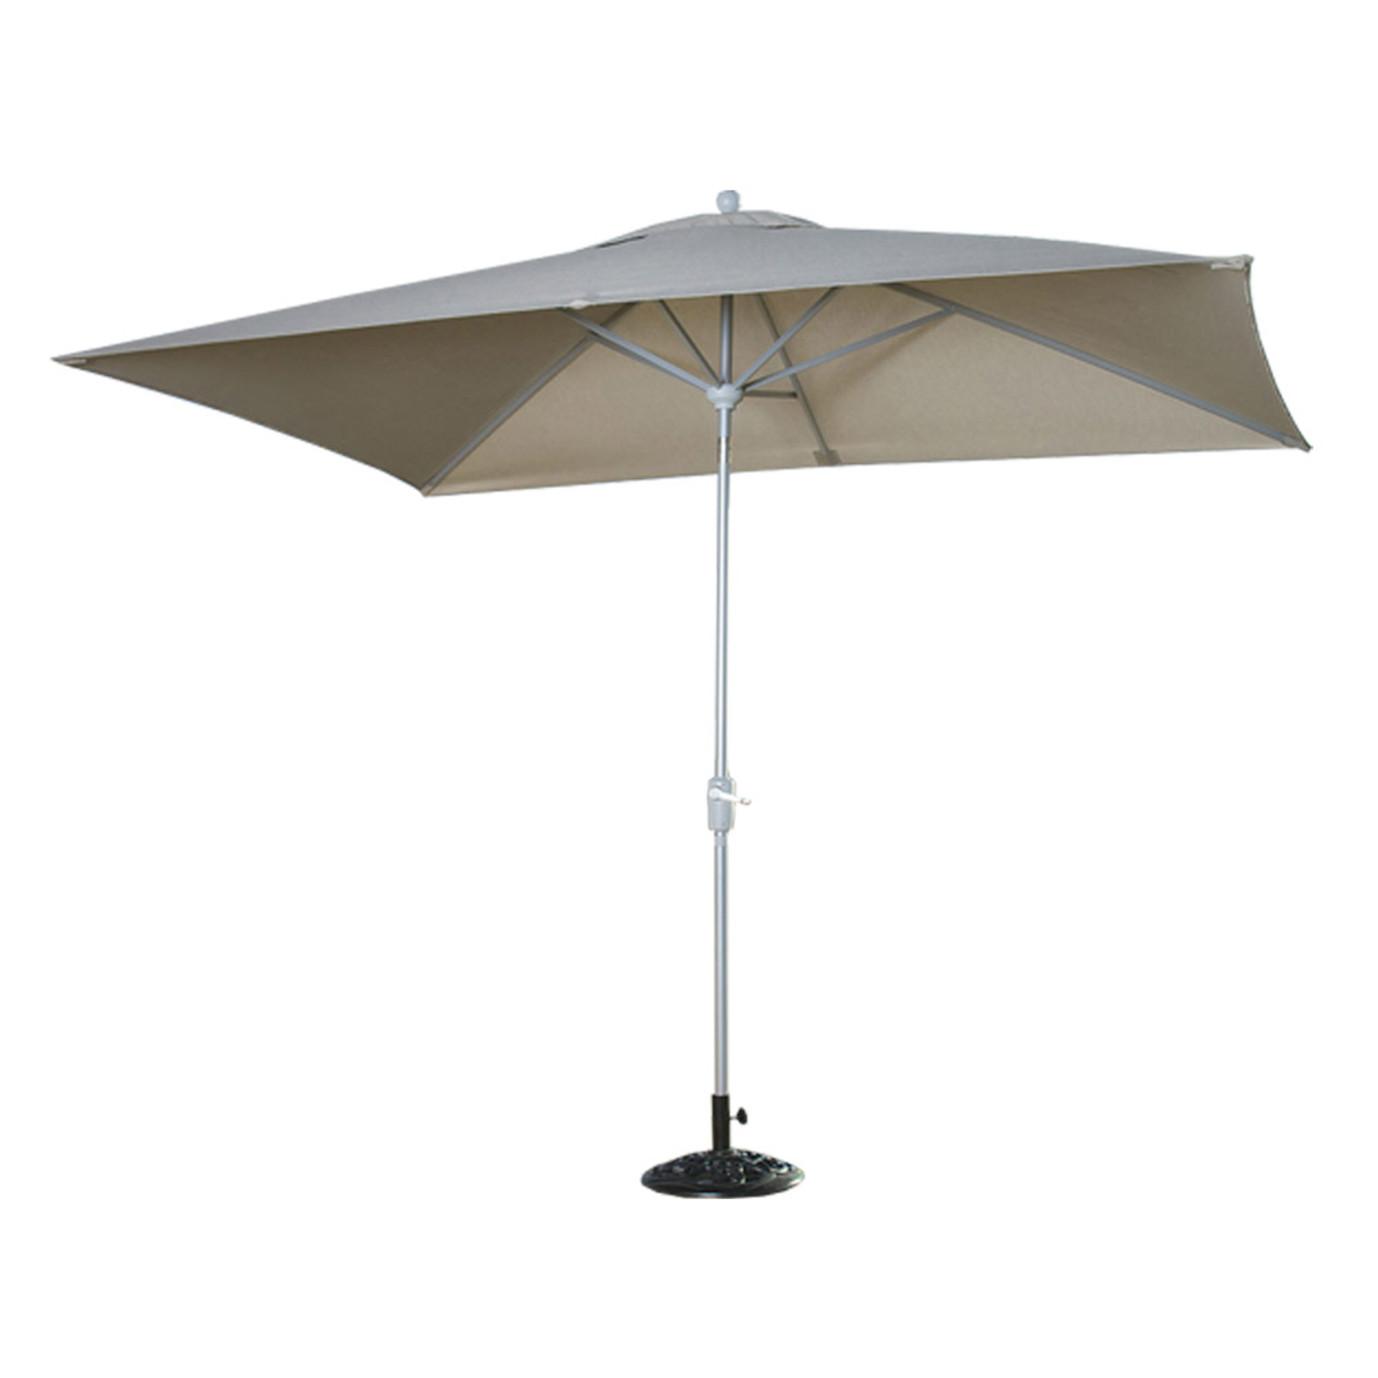 Portofino™ Comfort Auto-Tilt Dining Umbrella - Kona Taupe